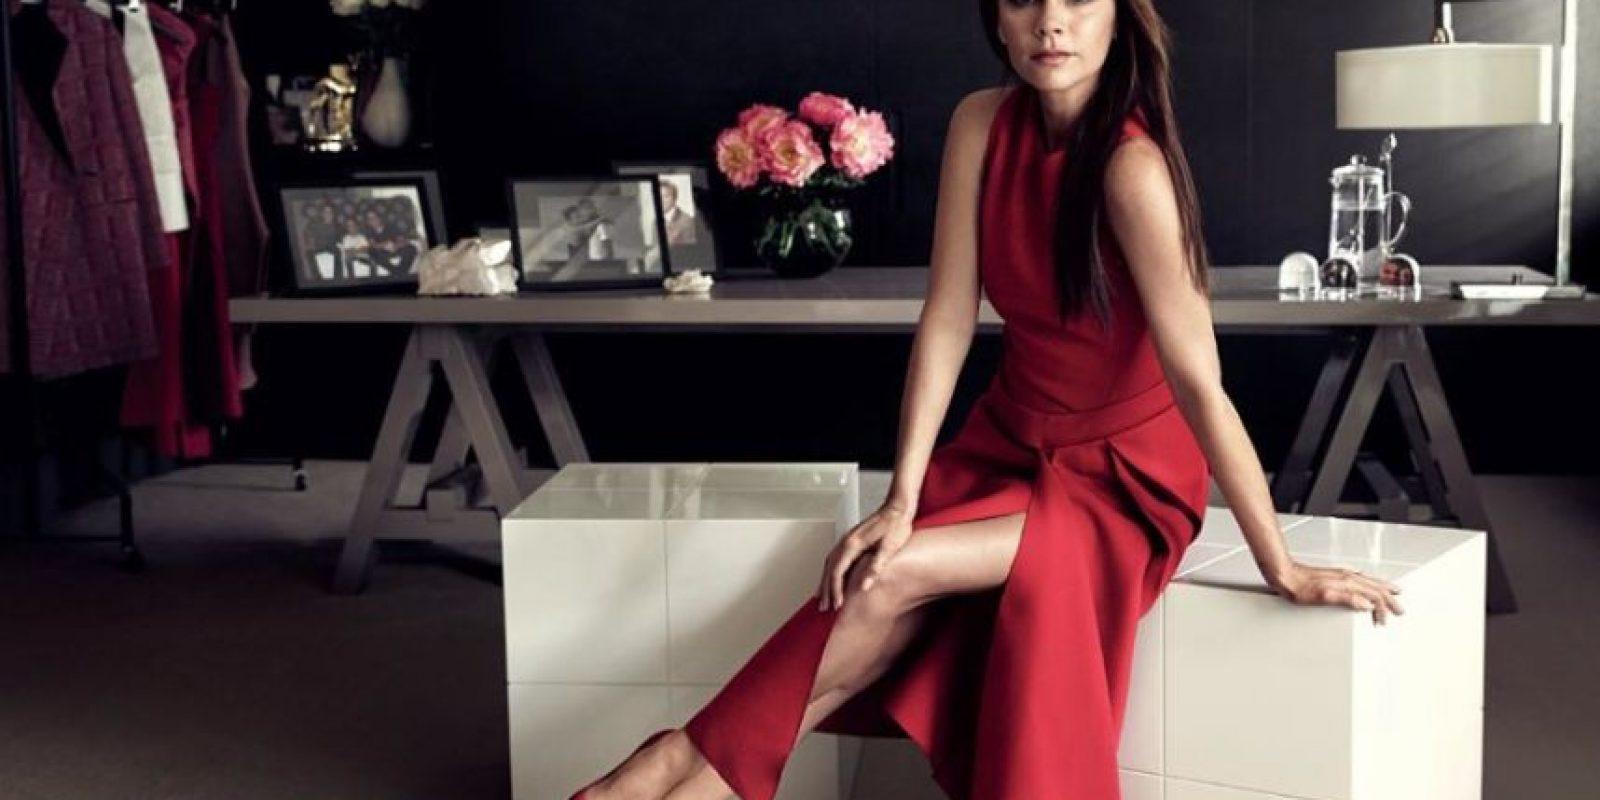 3. La socialité Victoria Beckham es duramente criticada por emplear a modelos extremadamente flacas. Foto:Vía Instagram/VictoriaBeckham